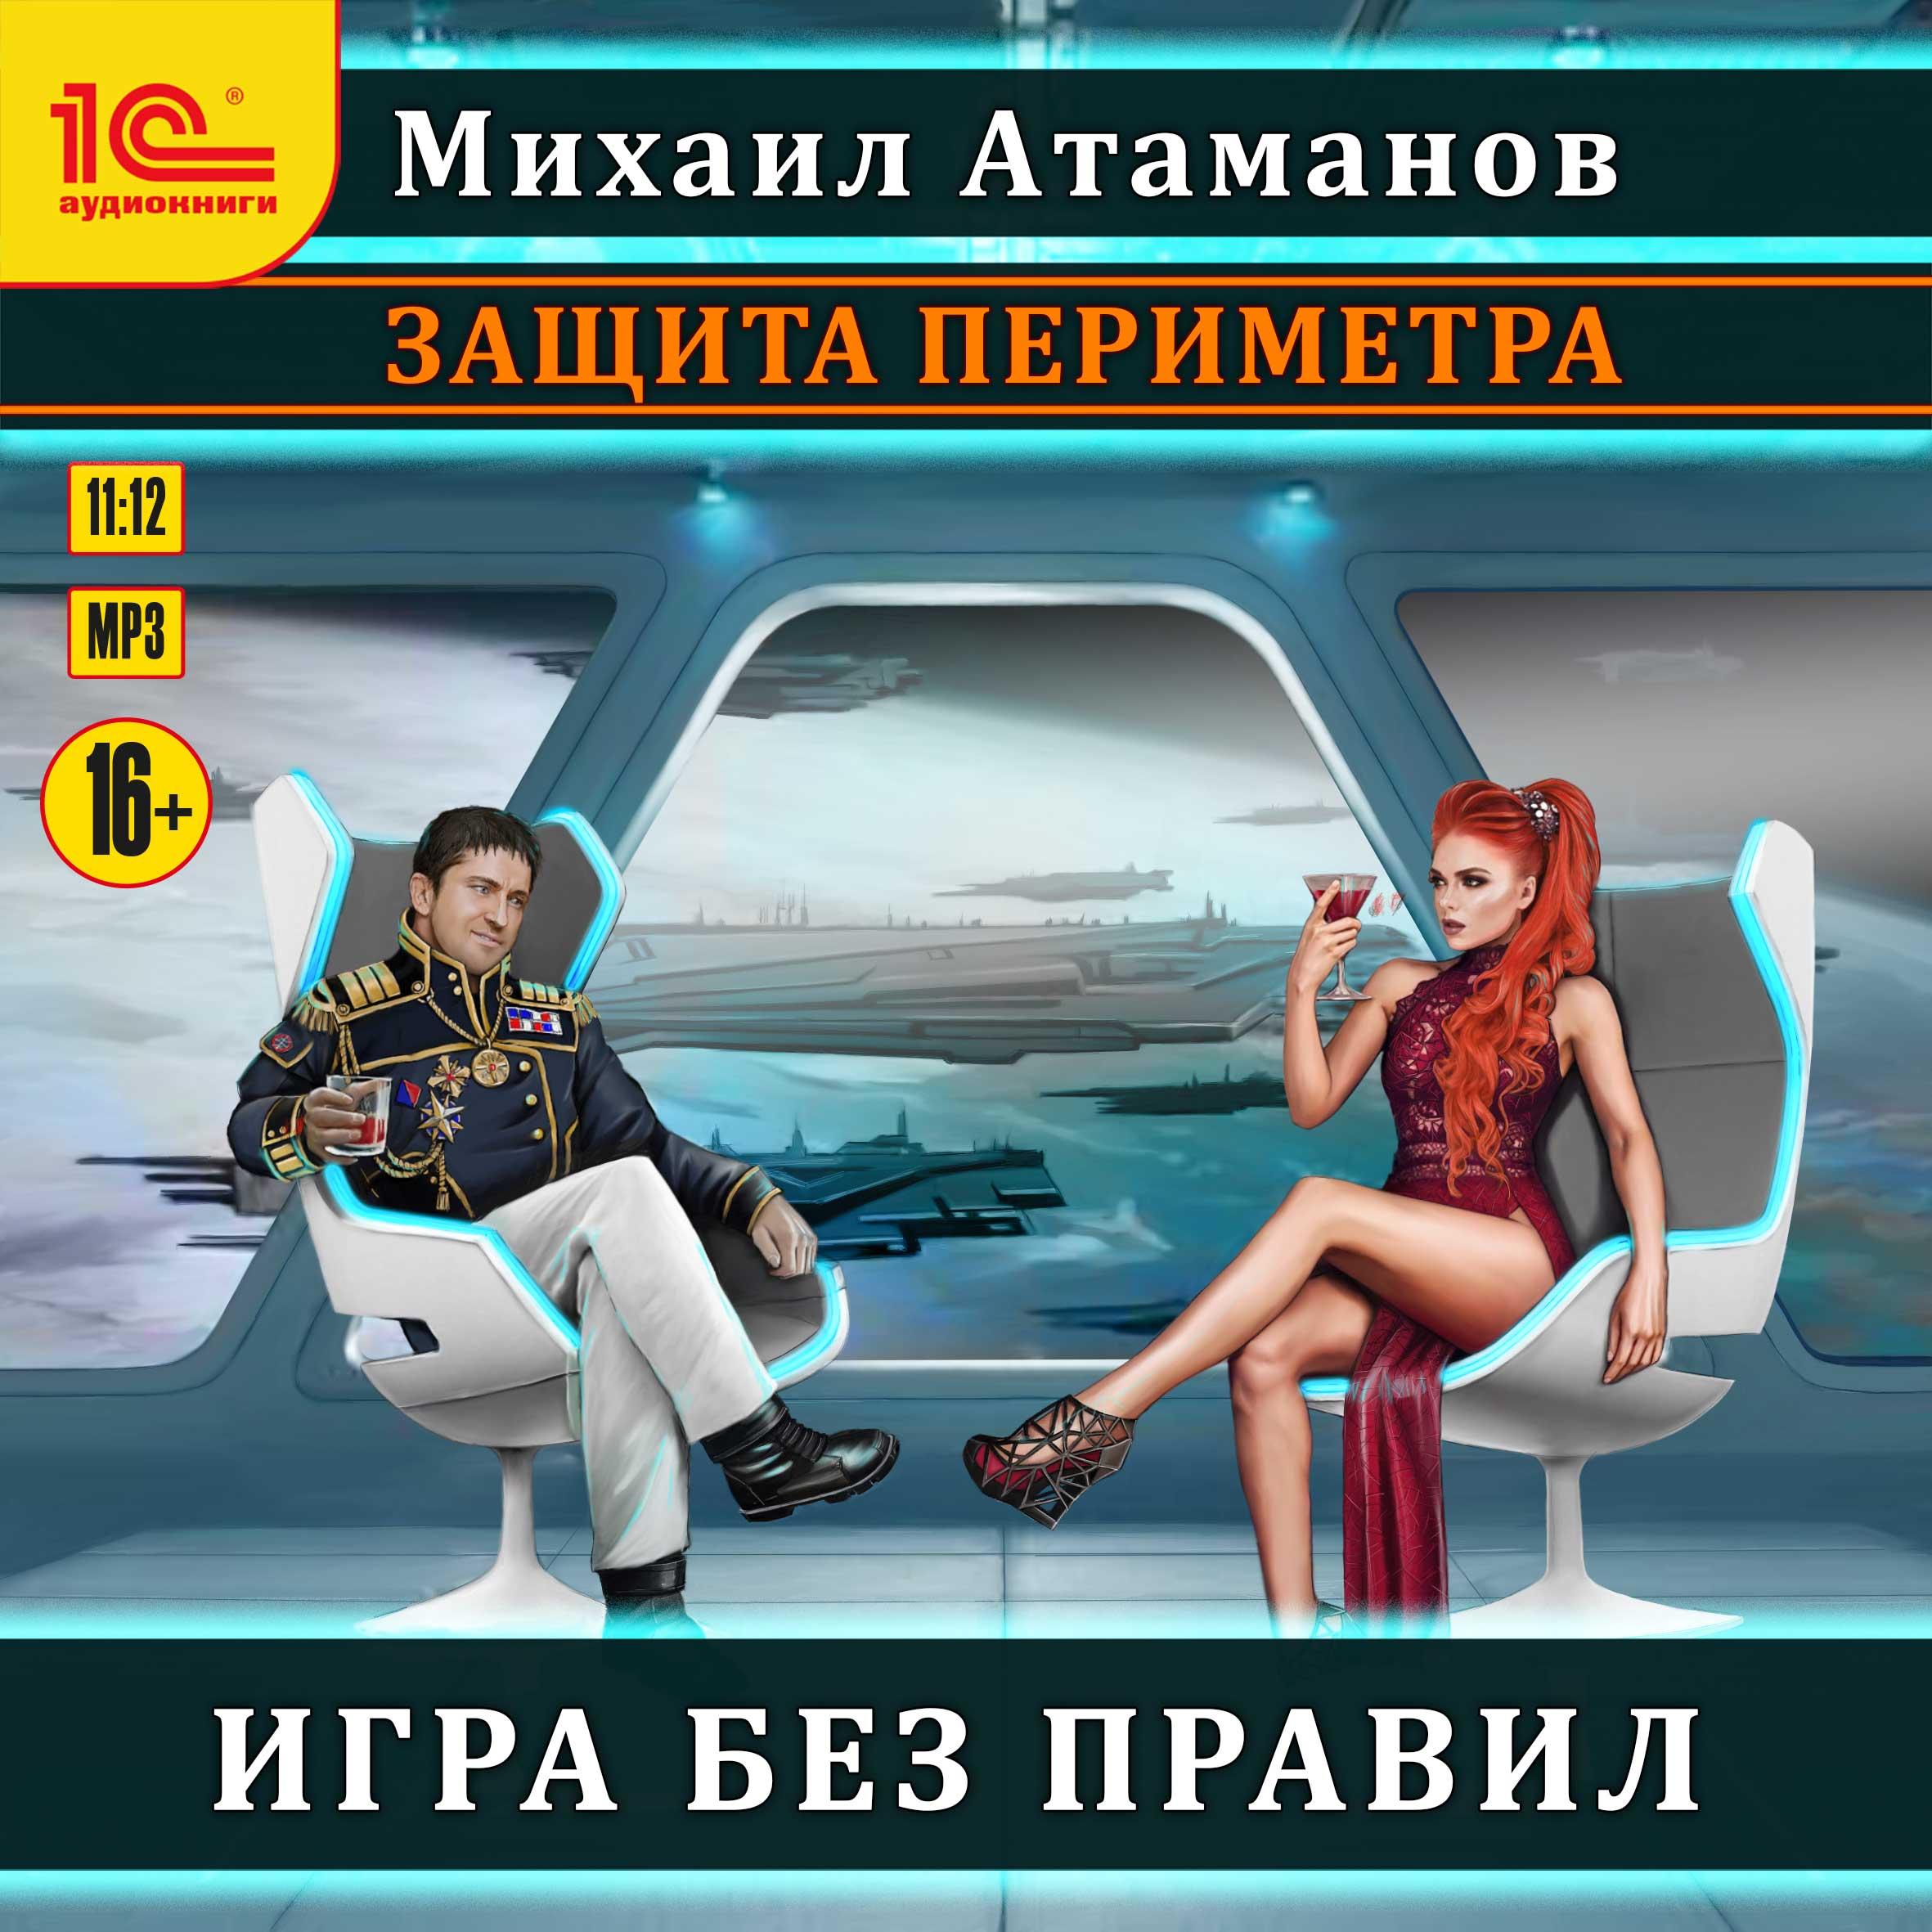 Михаил Атаманов Защита периметра: Игра без правил (цифровая версия) (Цифровая версия)